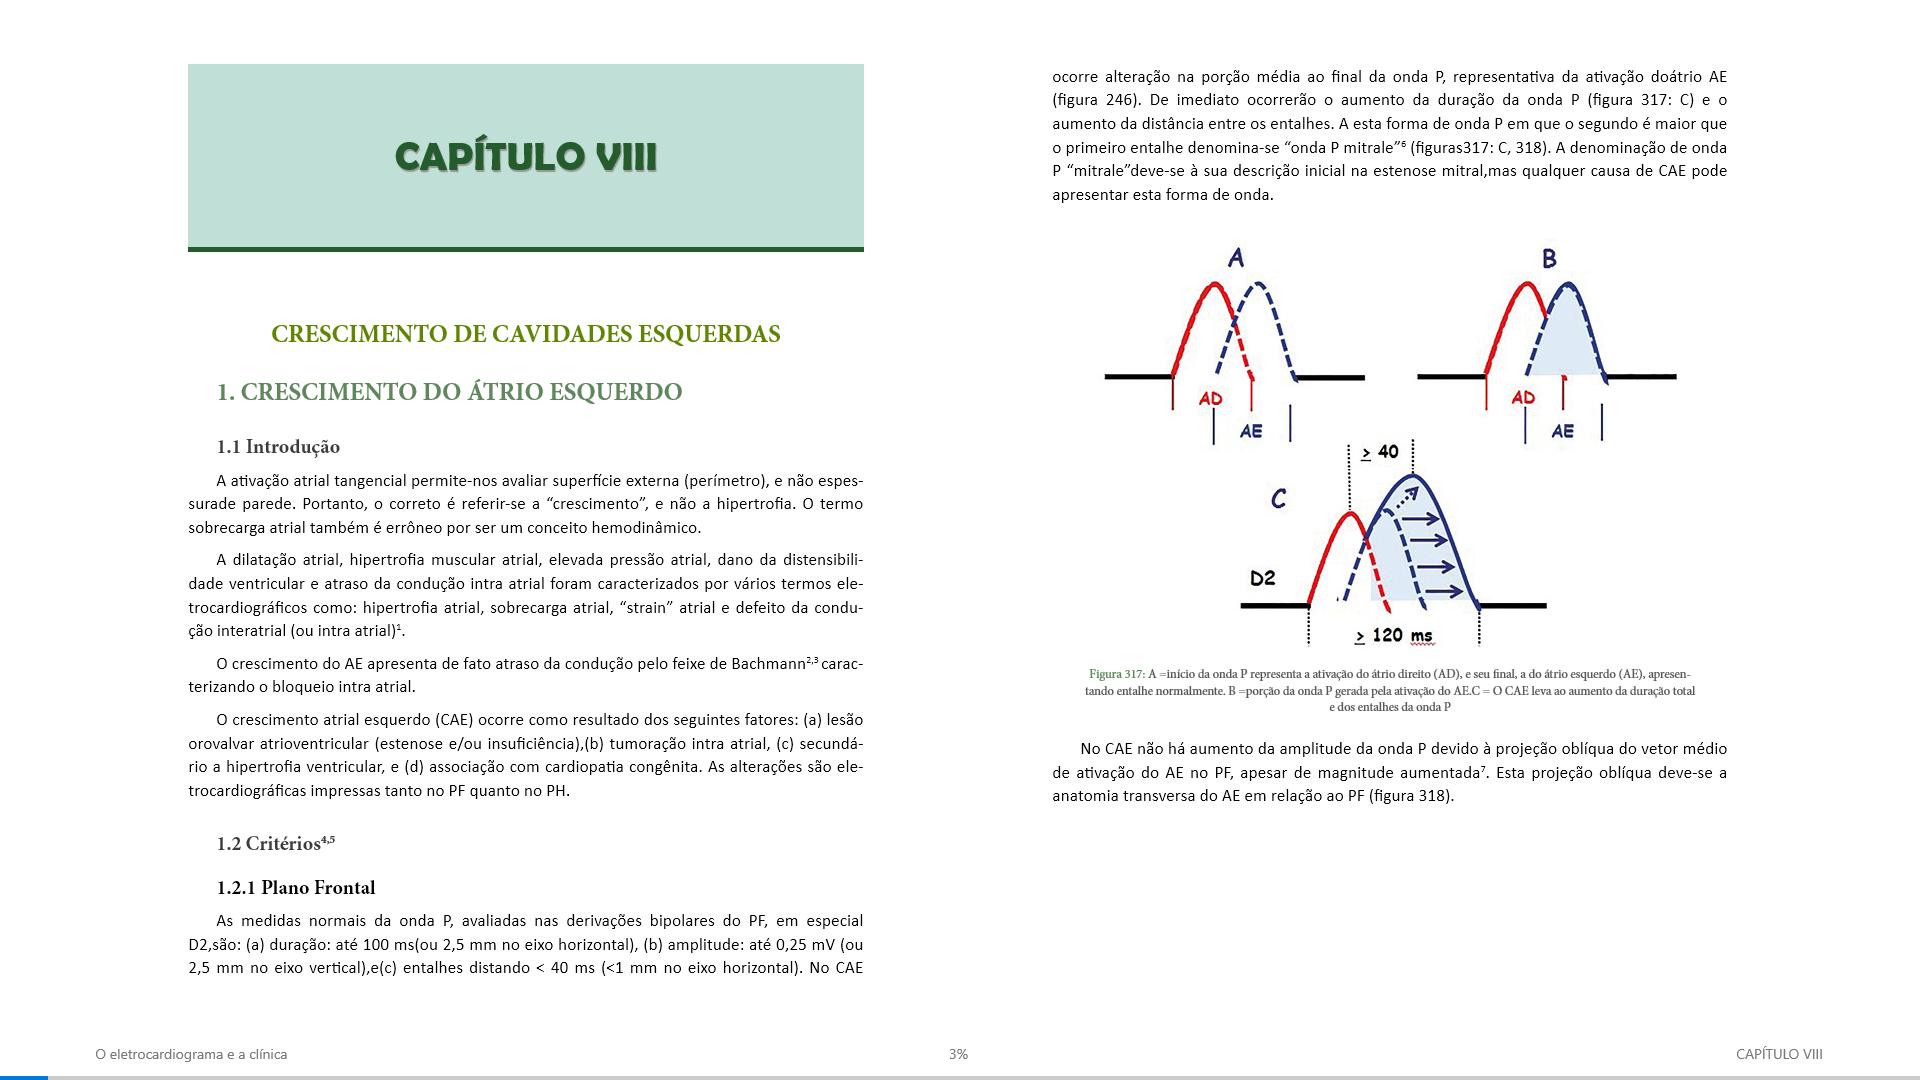 O eletrocardiograma e a clínica 1 - Eduardo Machado Andréa & Bruno Rustum Andréa